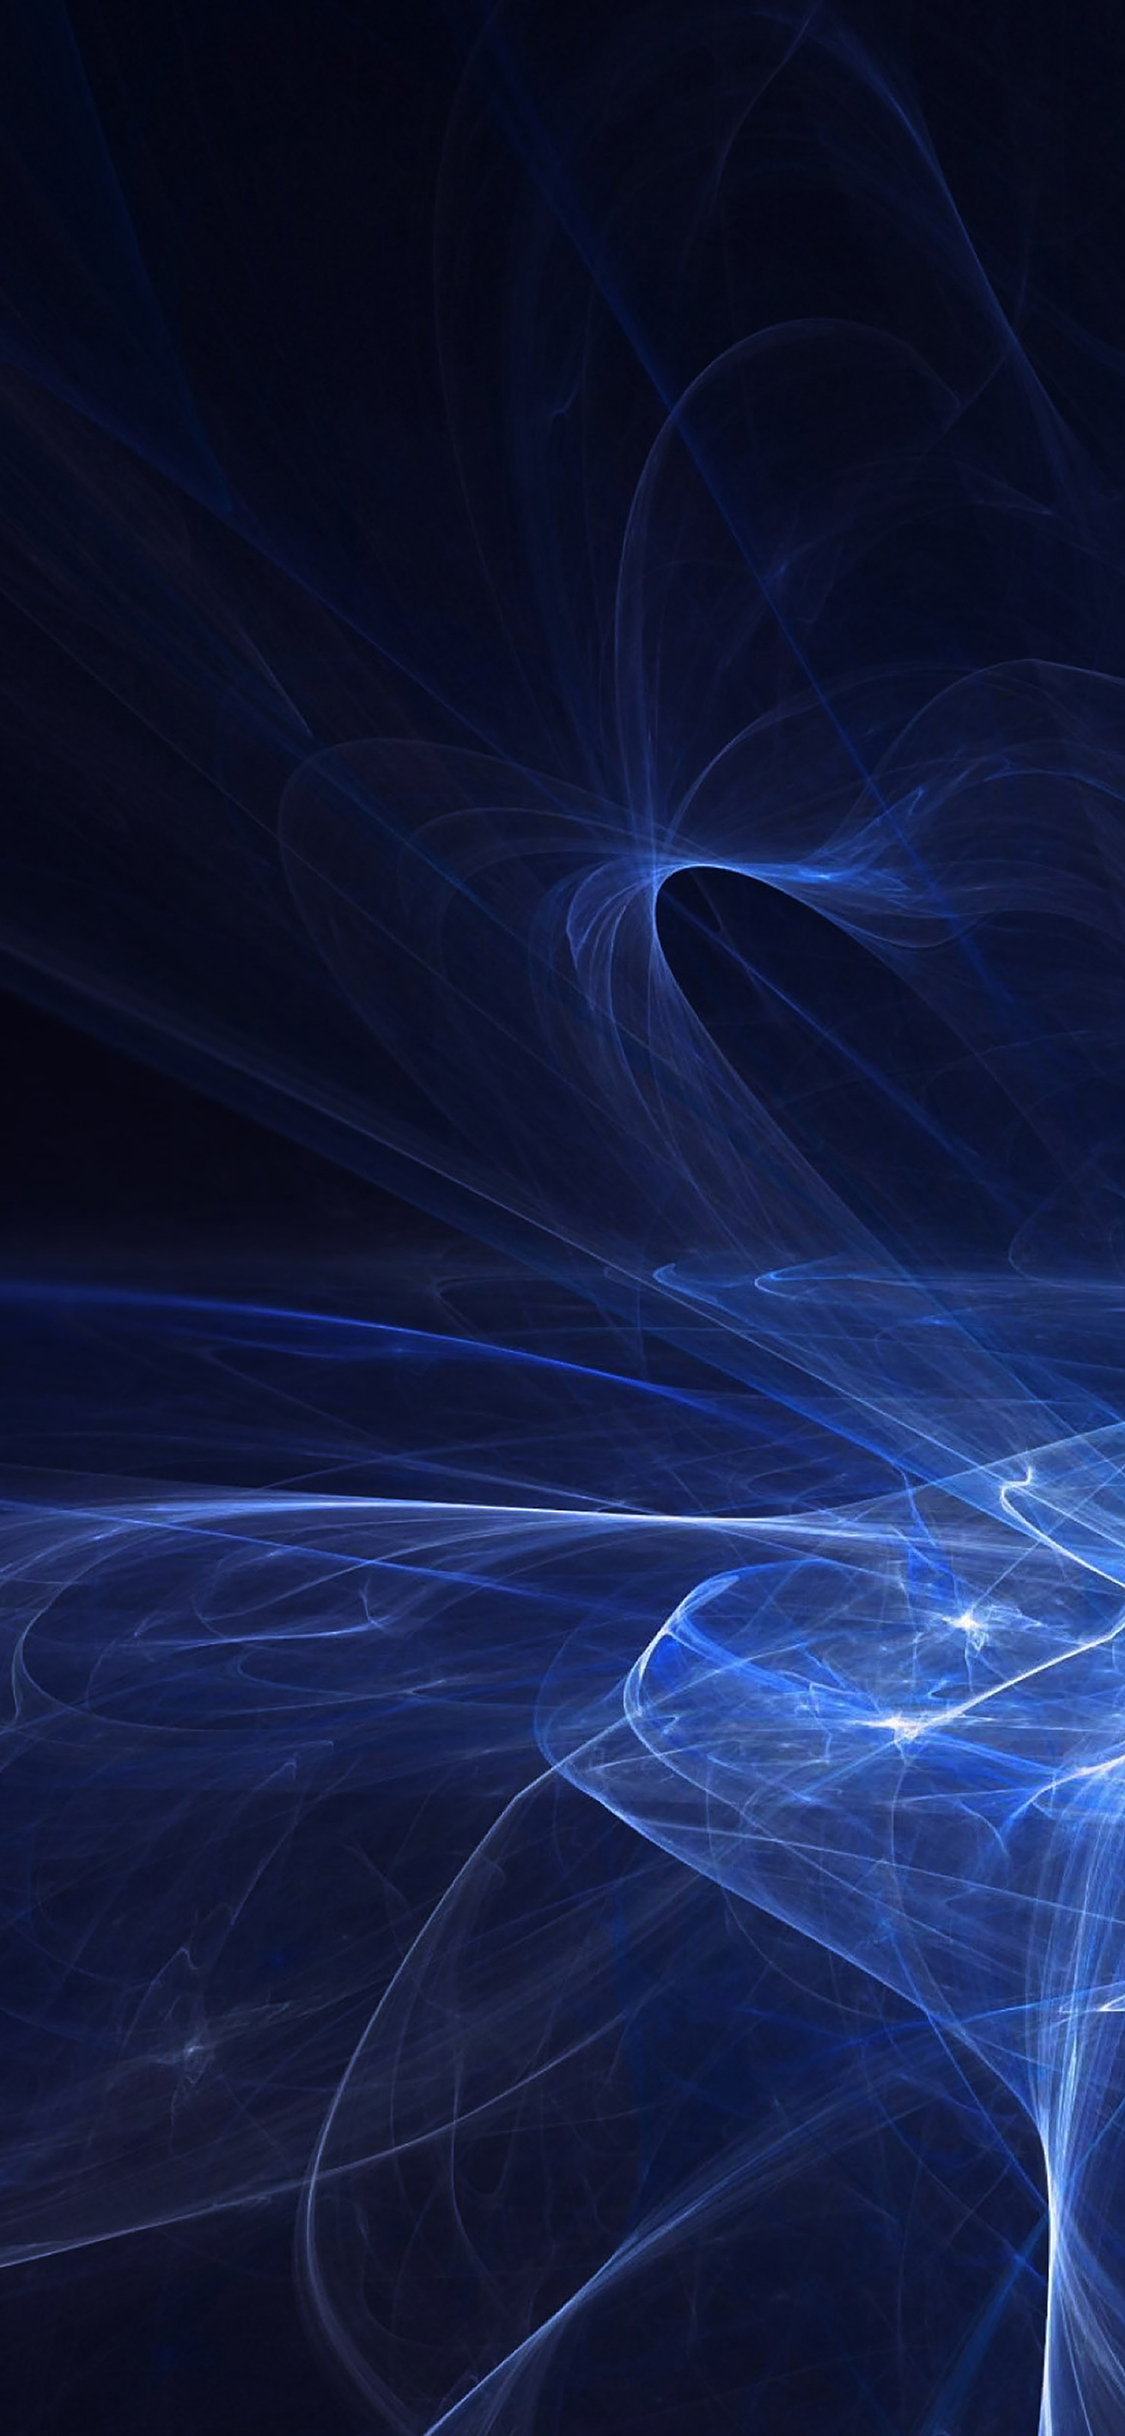 iPhoneXpapers.com-Apple-iPhone-wallpaper-va96-wallpaper-blue-smokes-aon-pattern